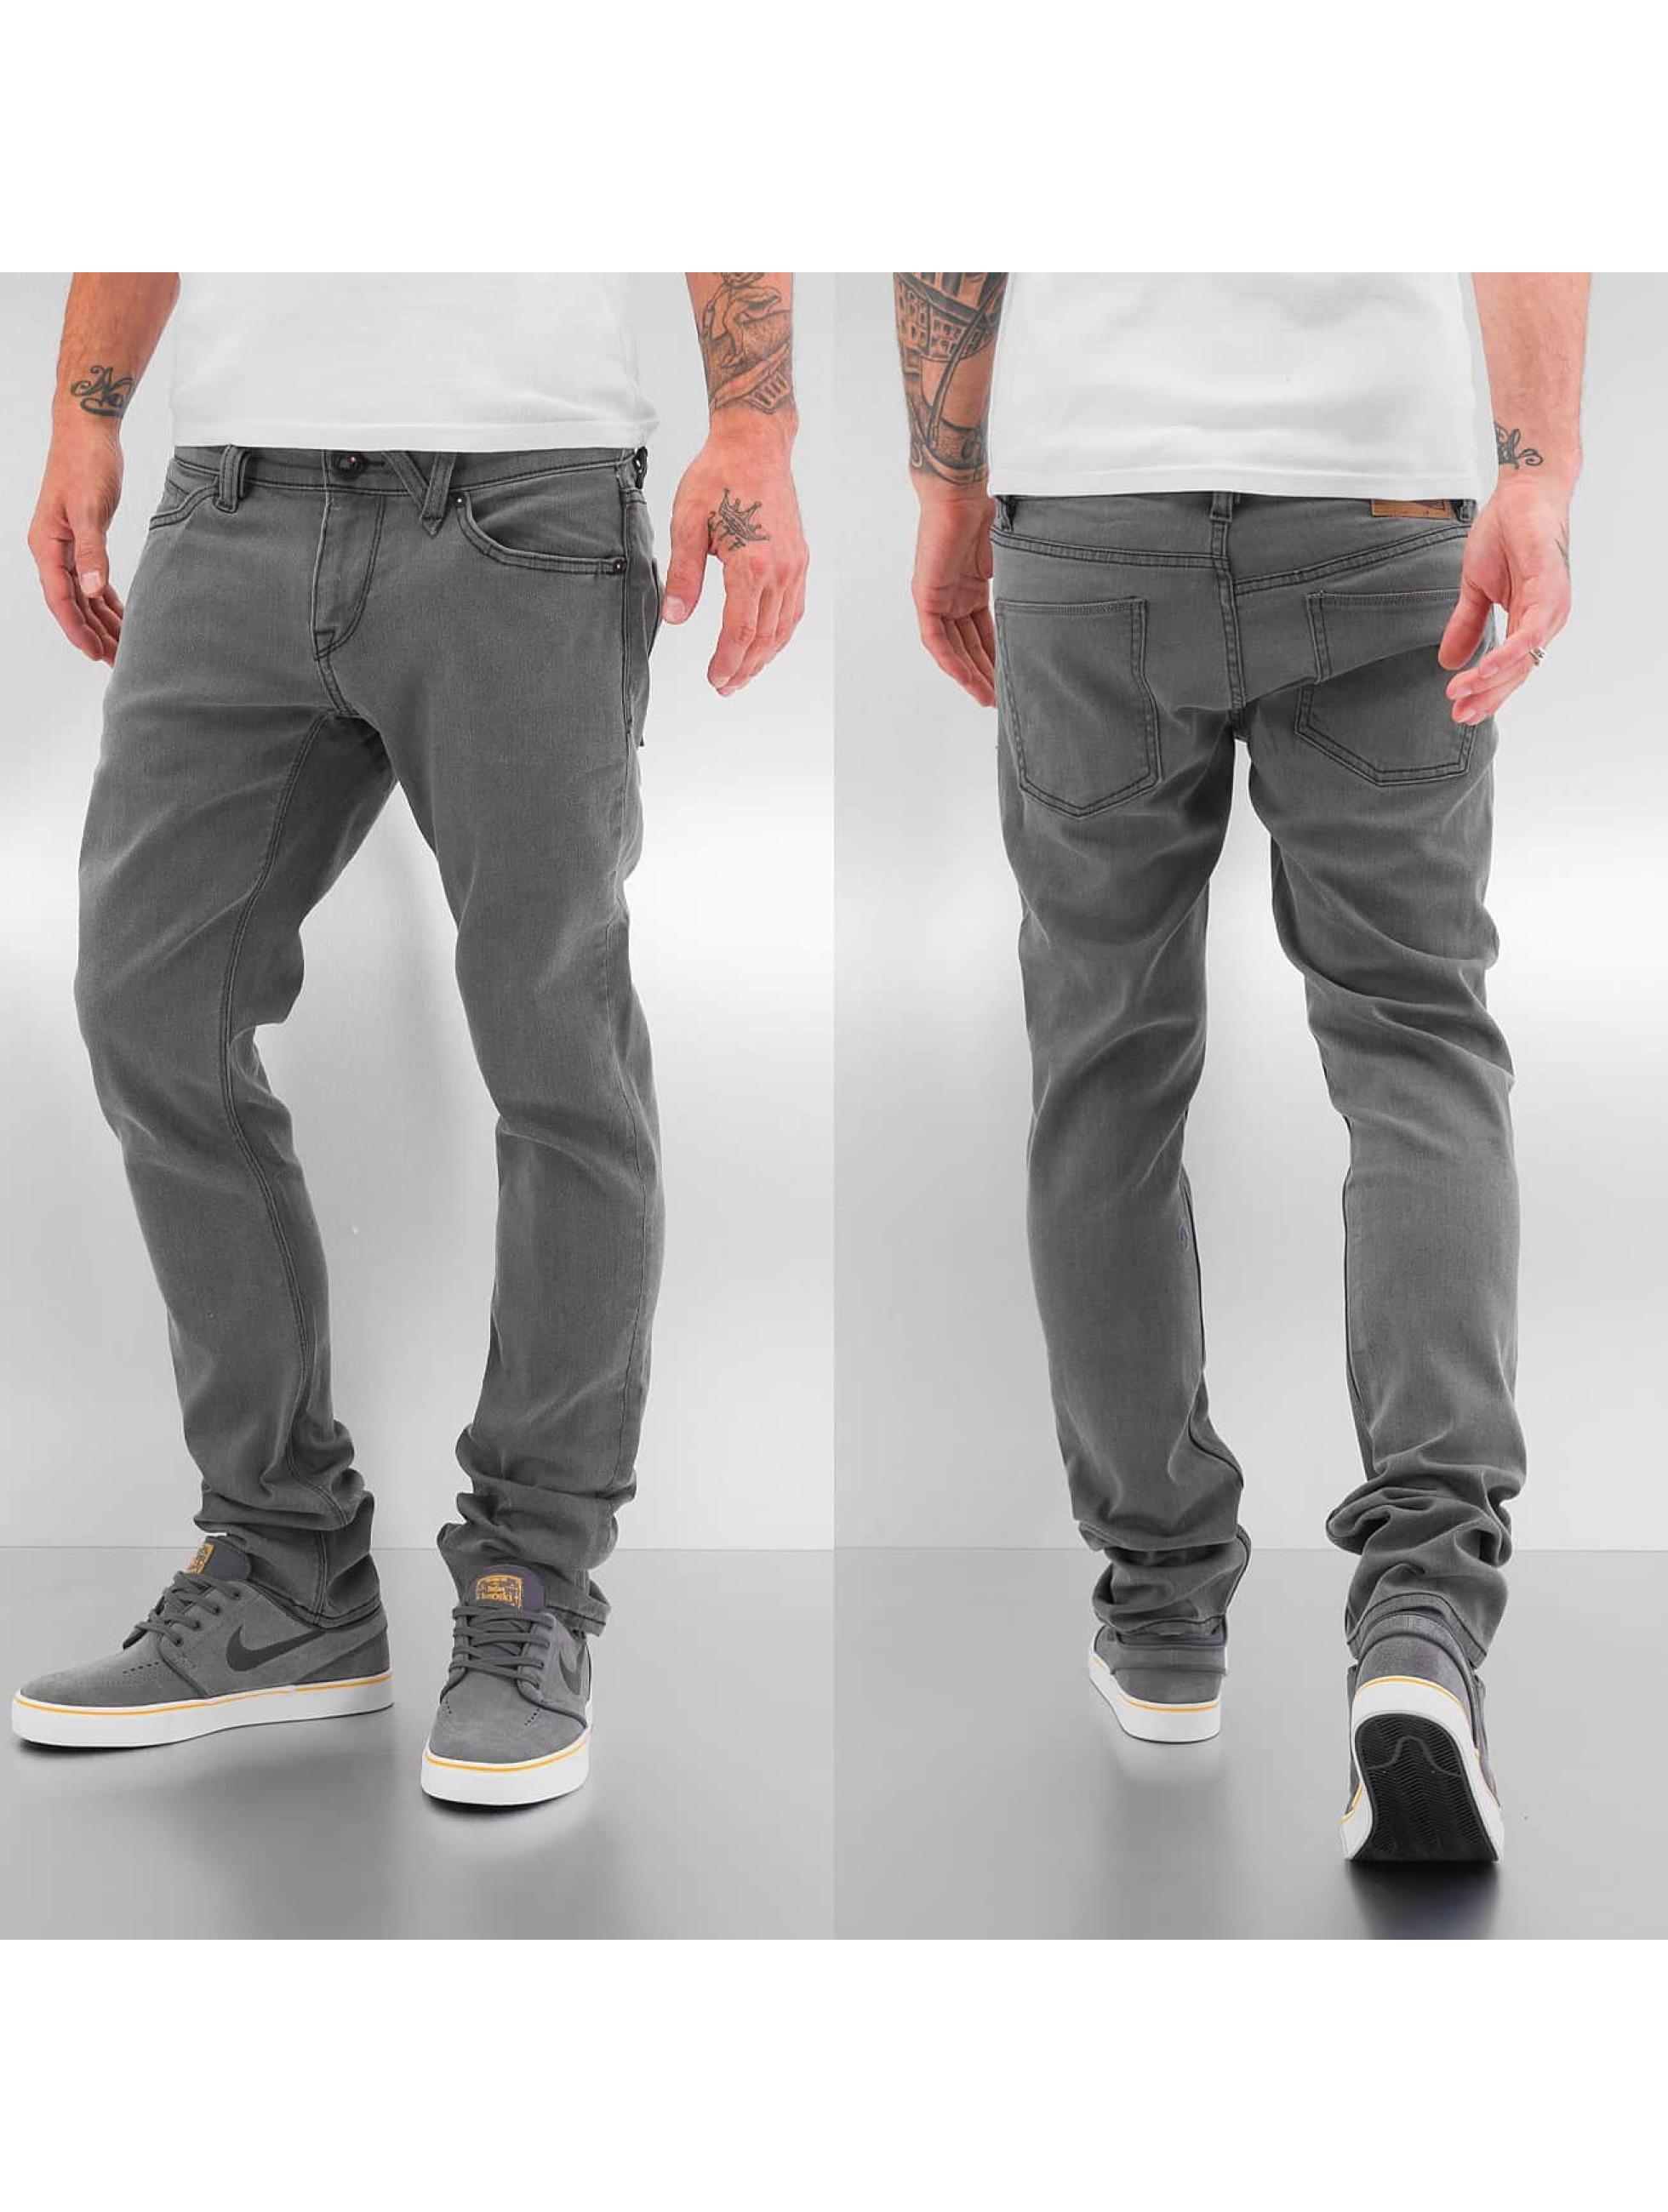 Volcom Männer Skinny Jeans 2x4 Denim in grau